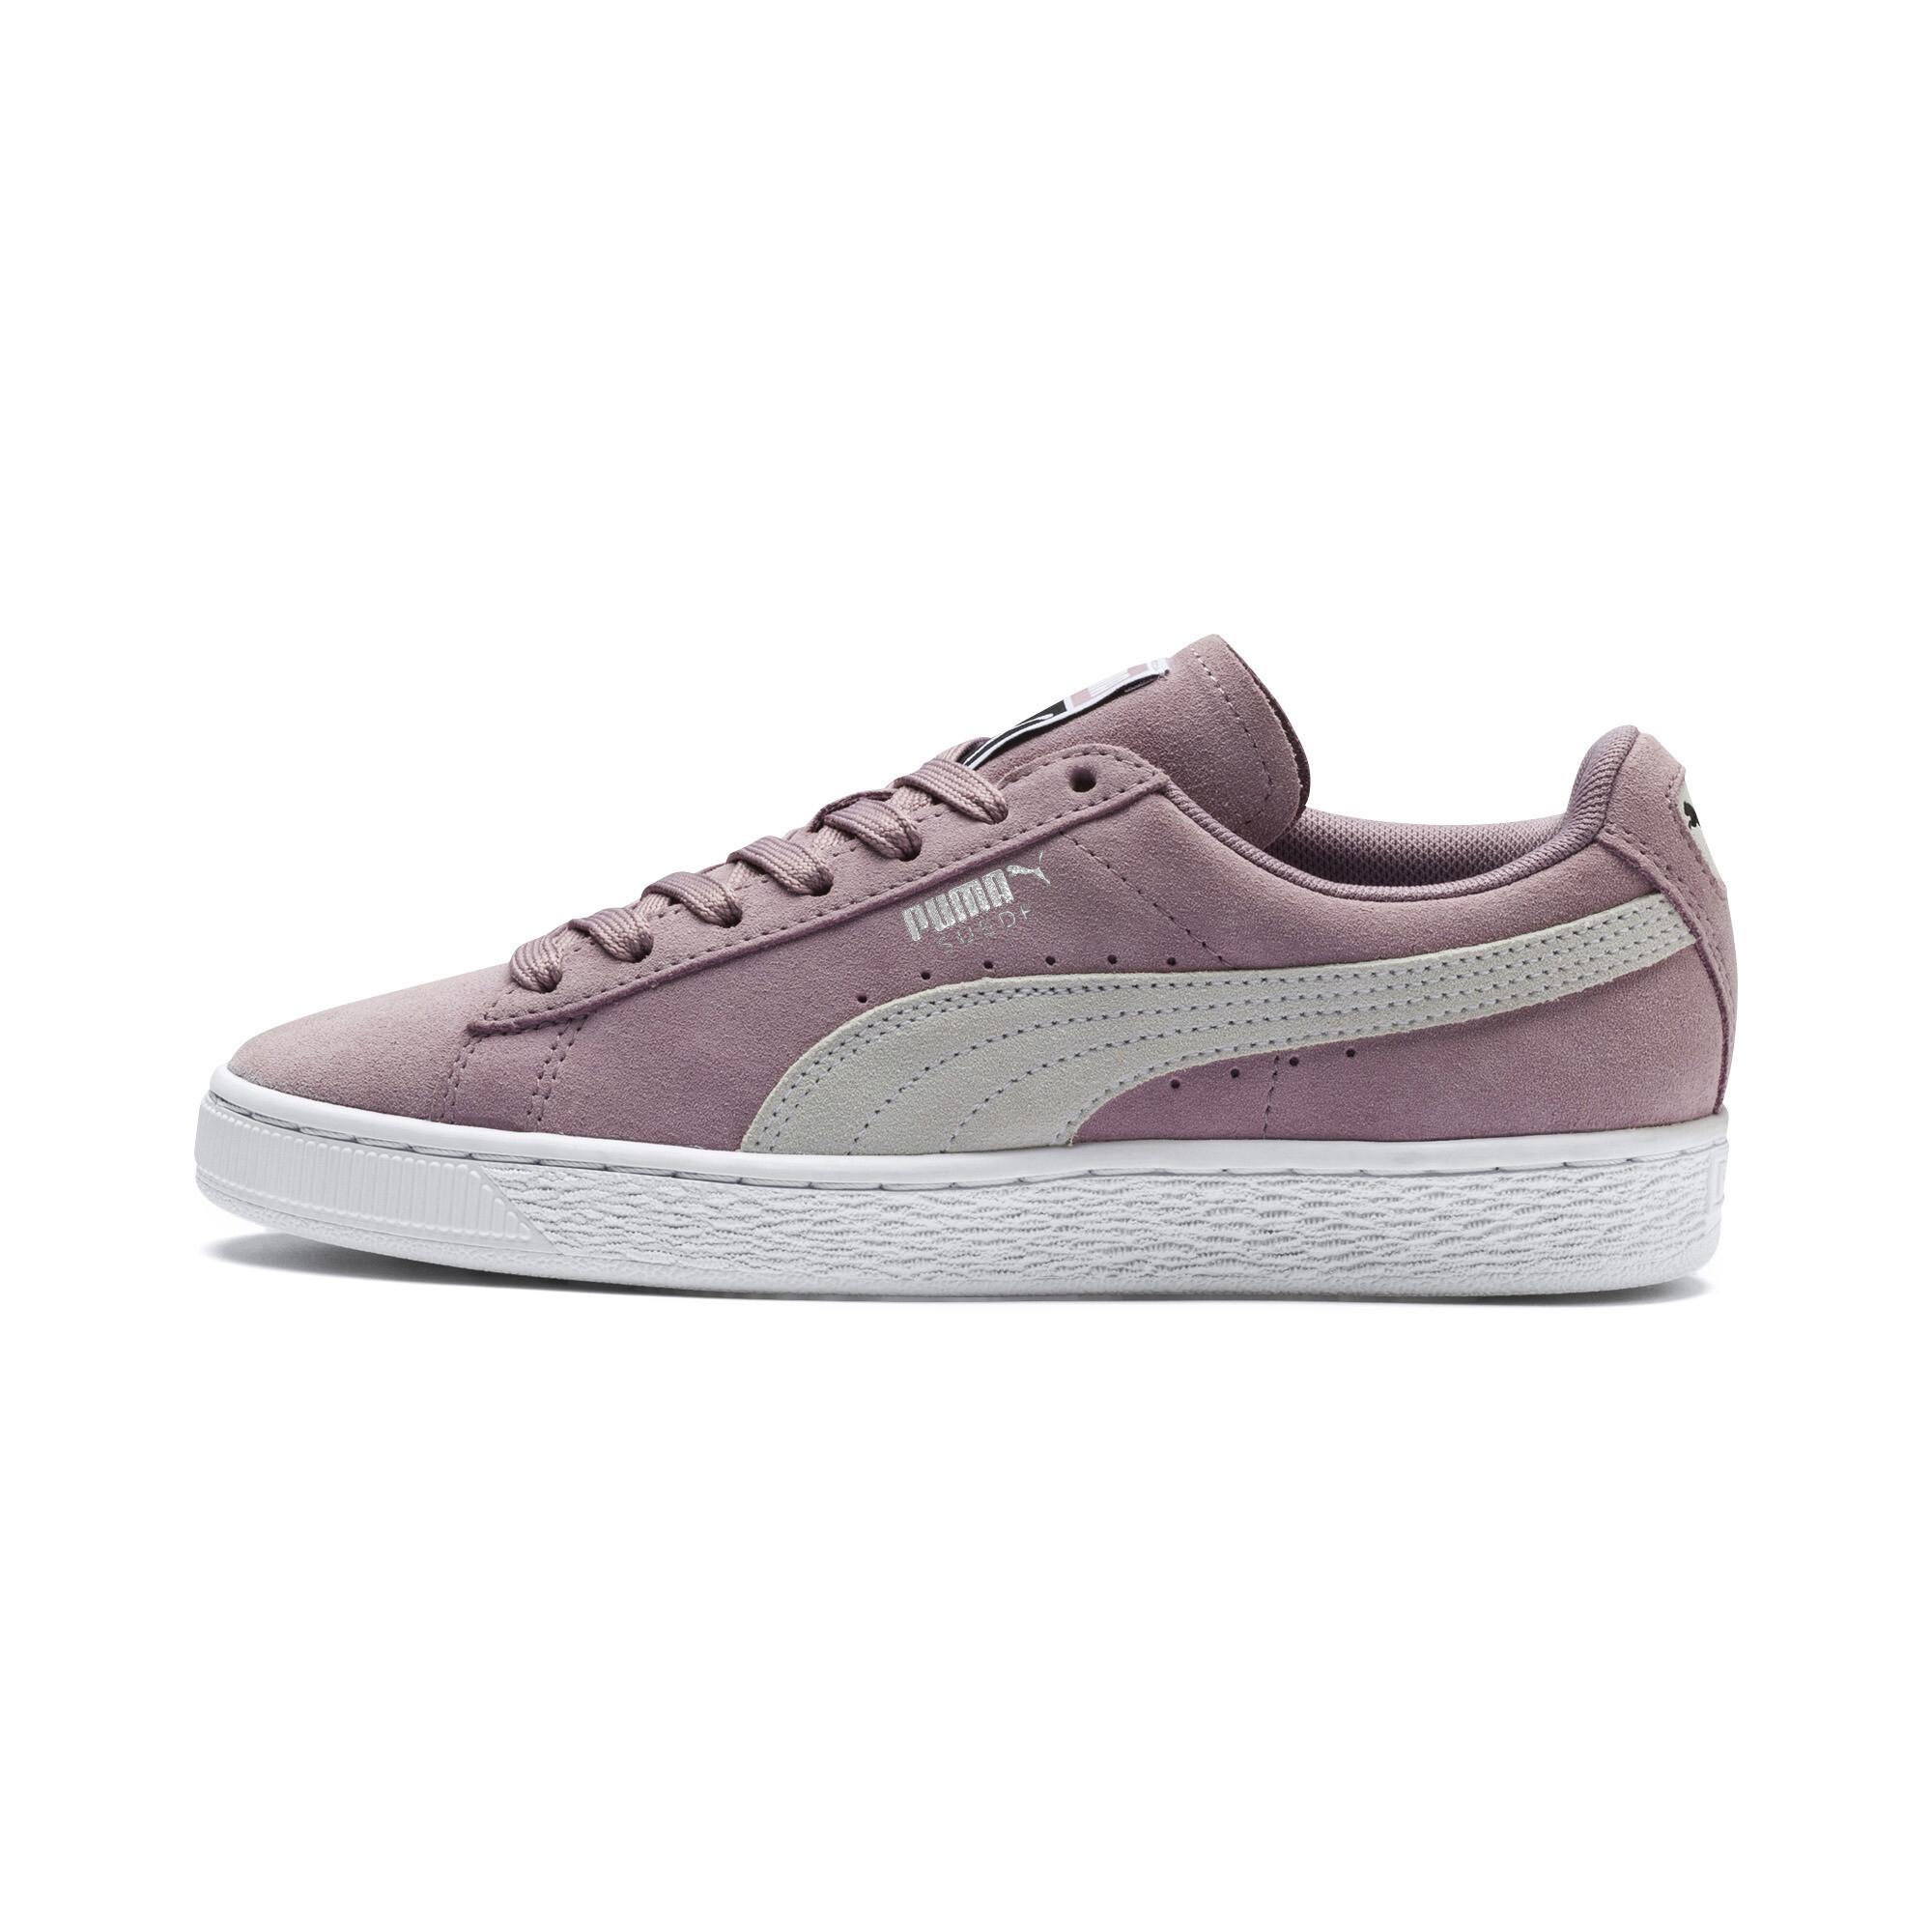 efeb347438 Women's Suede Classic Sneakers   90 - Purple   Puma